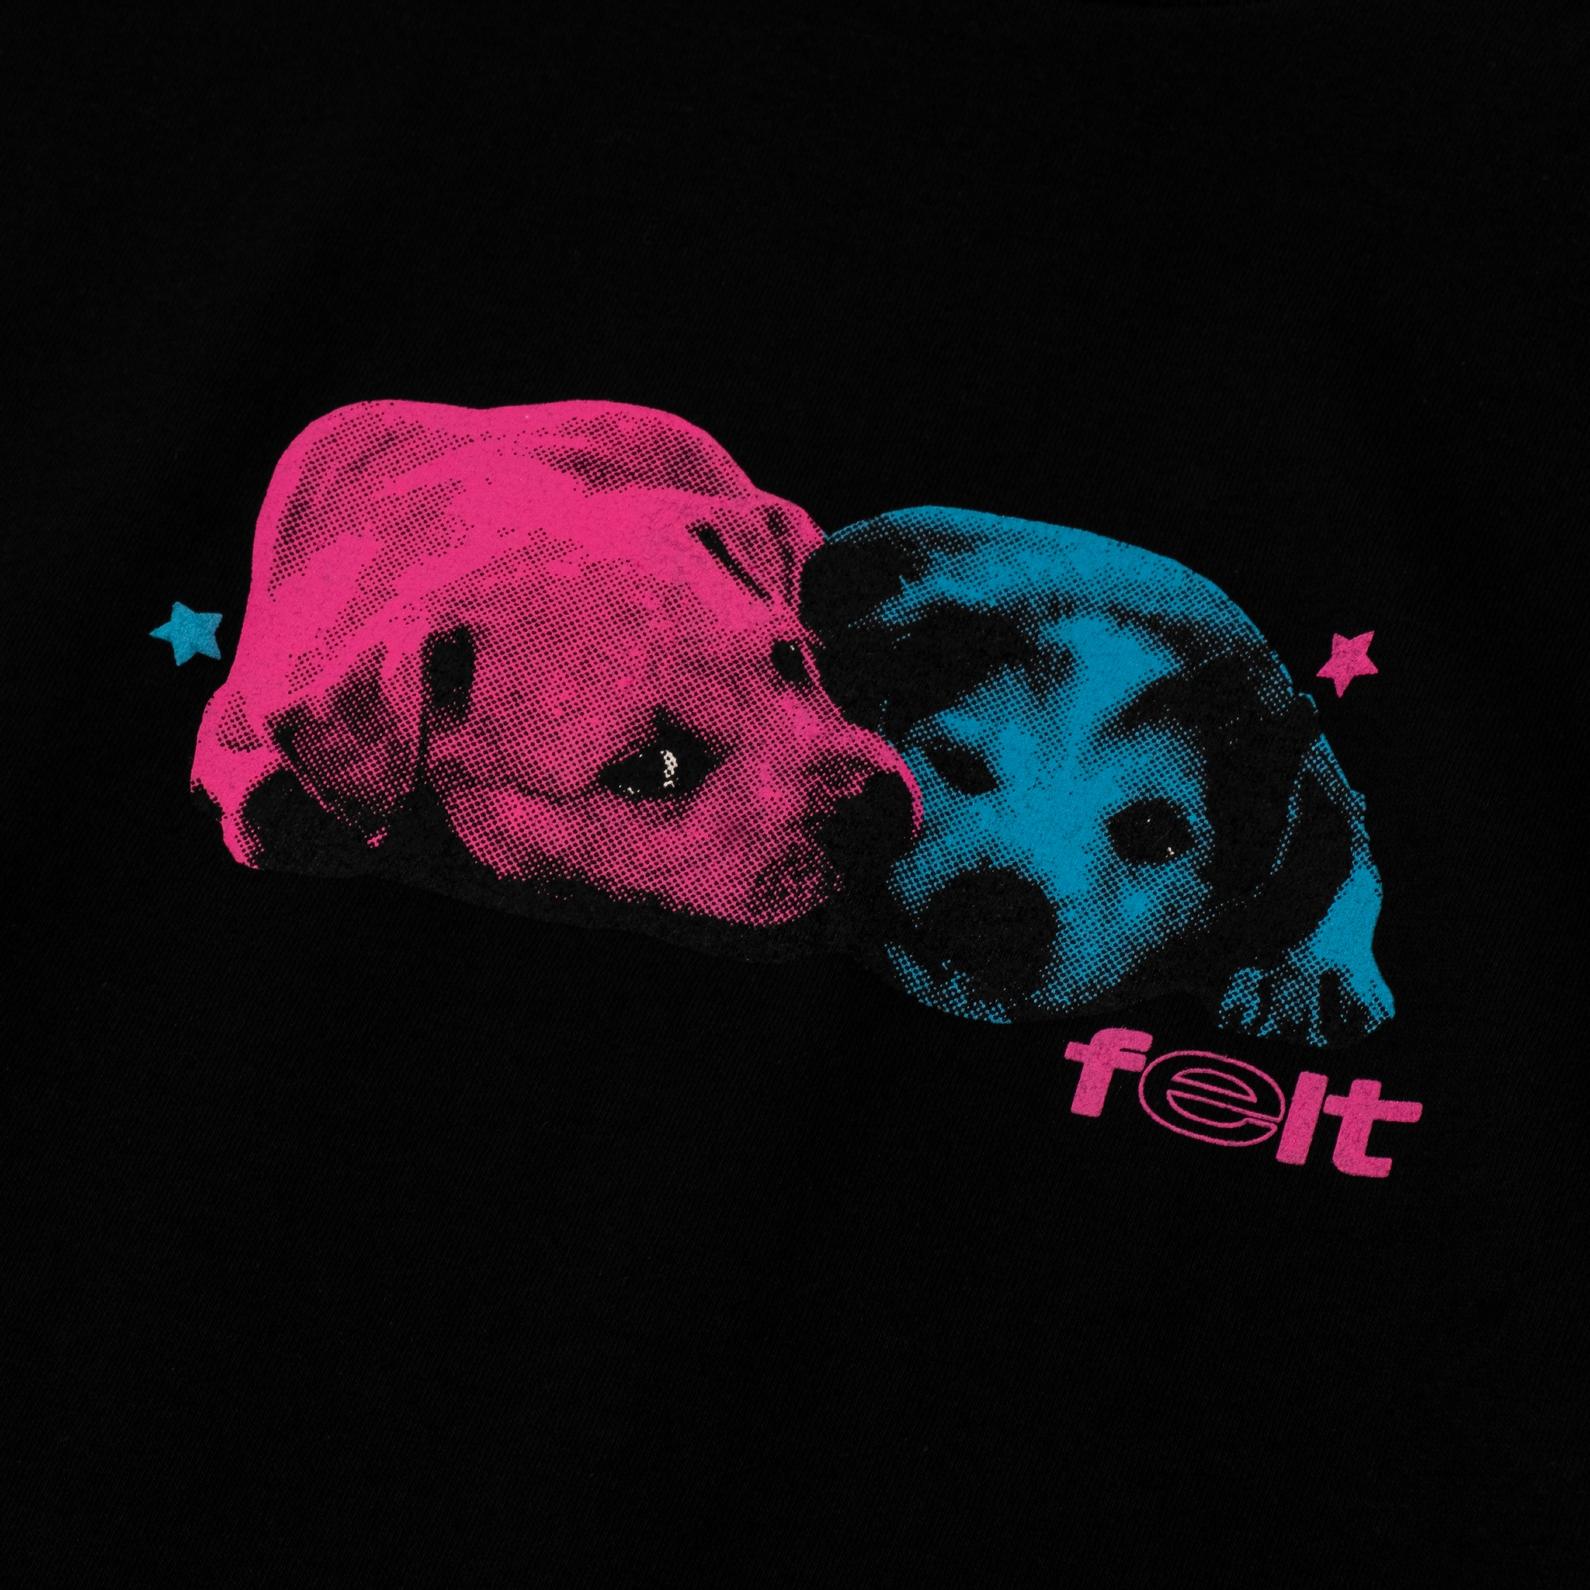 【FELT/フェルト】GOOD BOYS T-SHIRT Tシャツ / BLACK